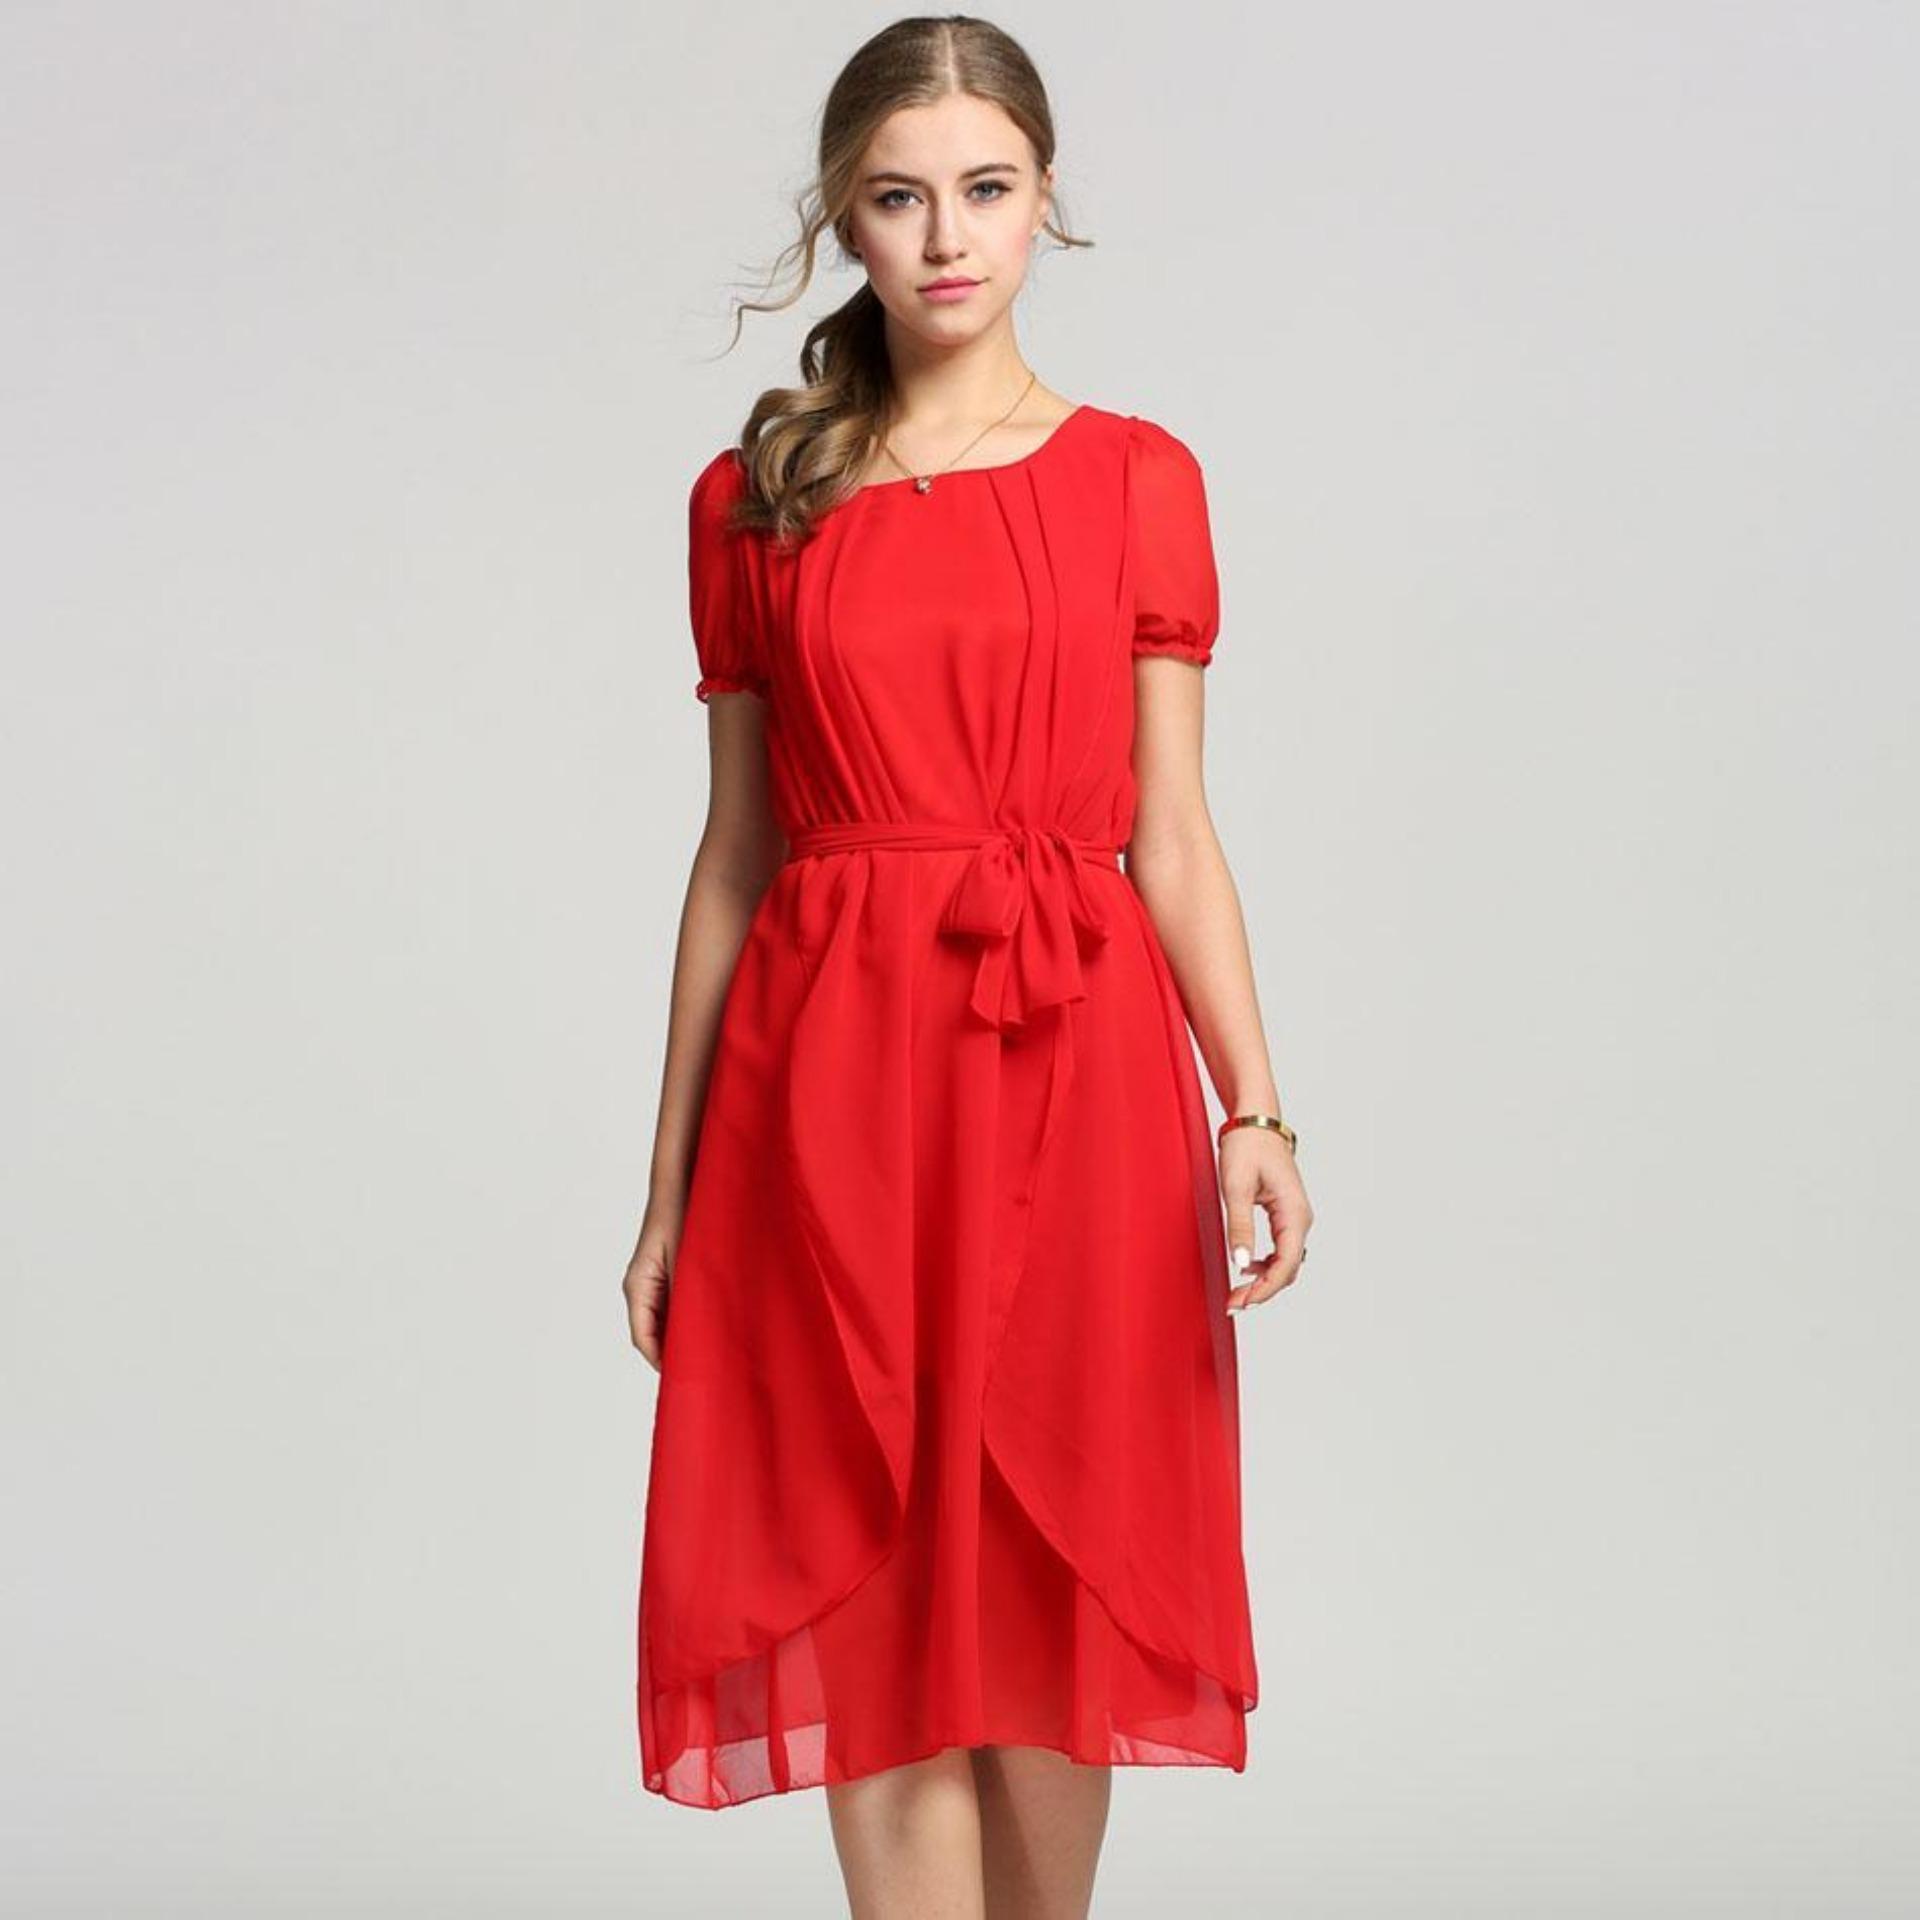 Linemart Bohemian Chiffon Dress (Red) - thumbnail